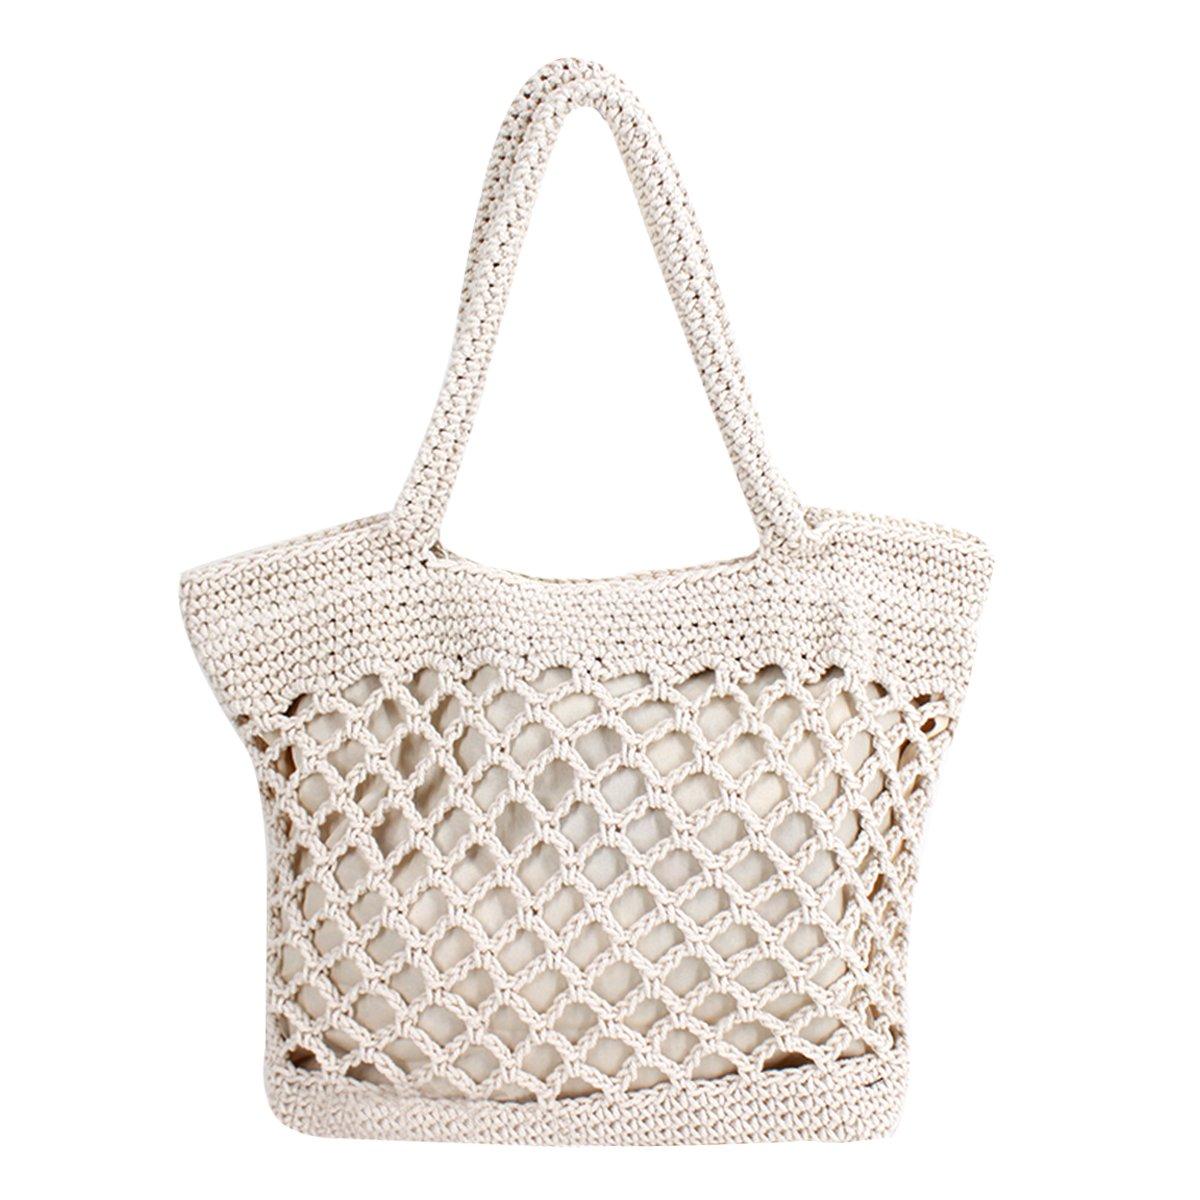 Mily Fashion Women Girls Summer Beach Bag Hollow Out Tote Handbag Net Woven Shoulder Bag Hobo Bag Travel Bag